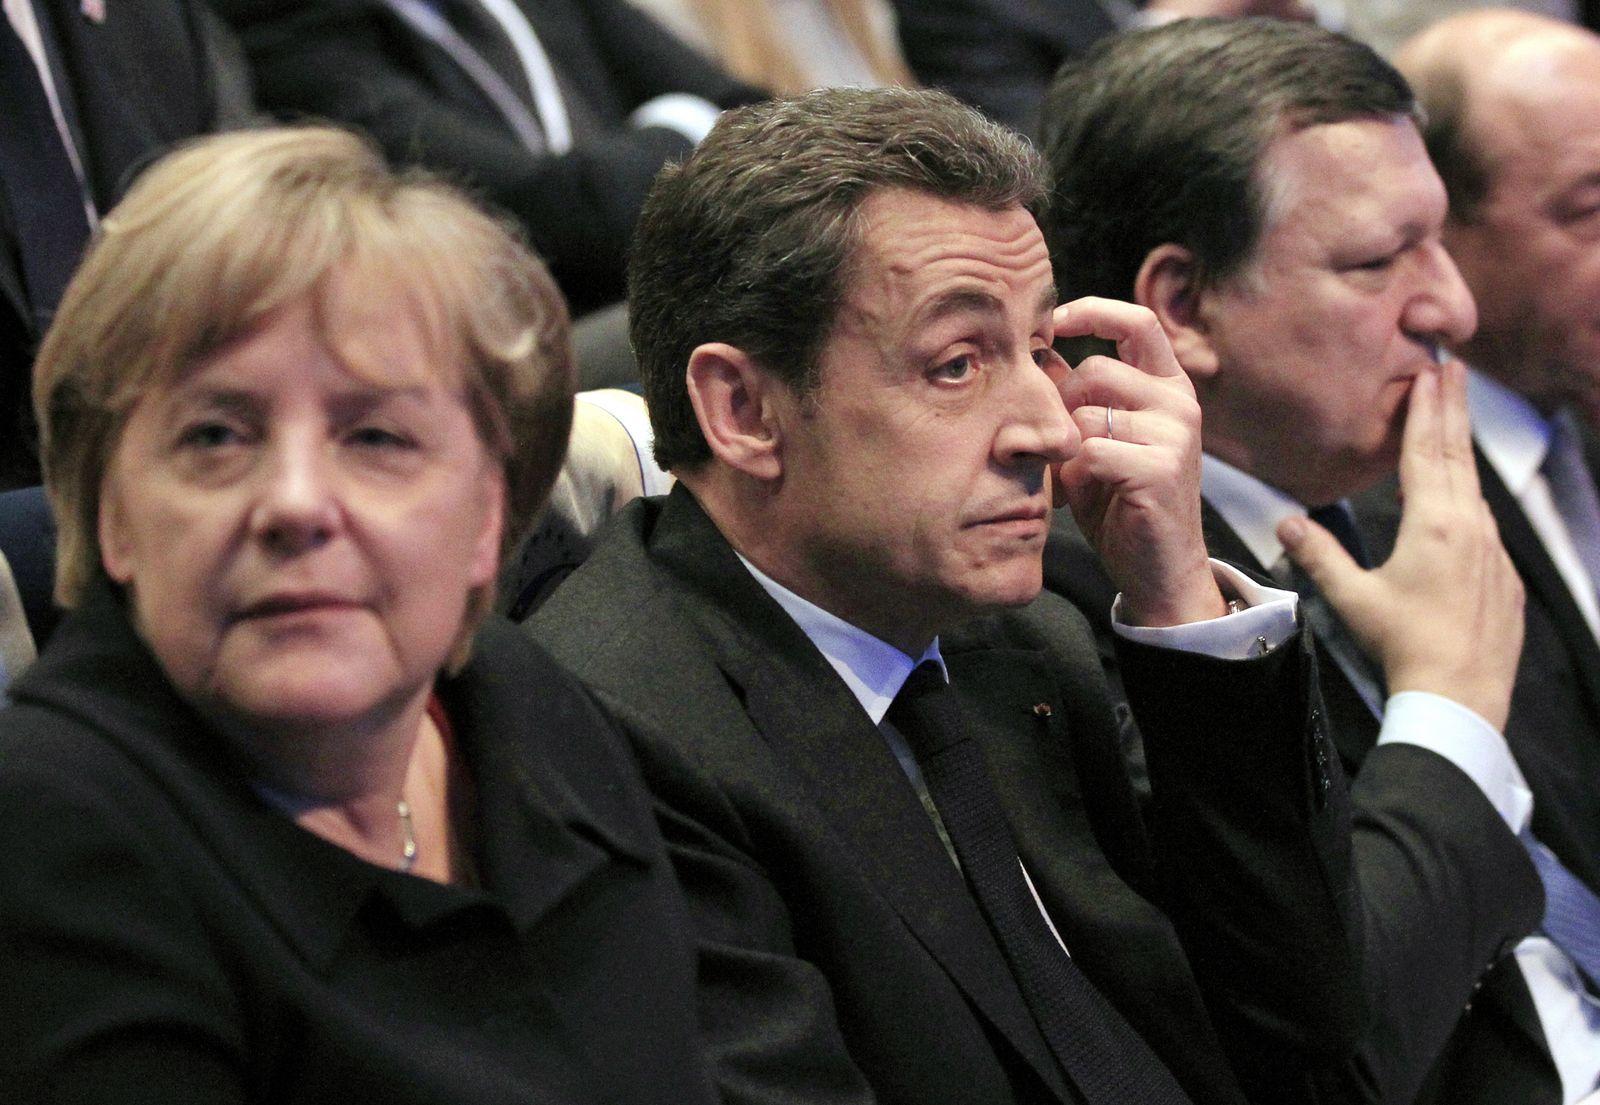 Merkel / Sarkozy / Barroso